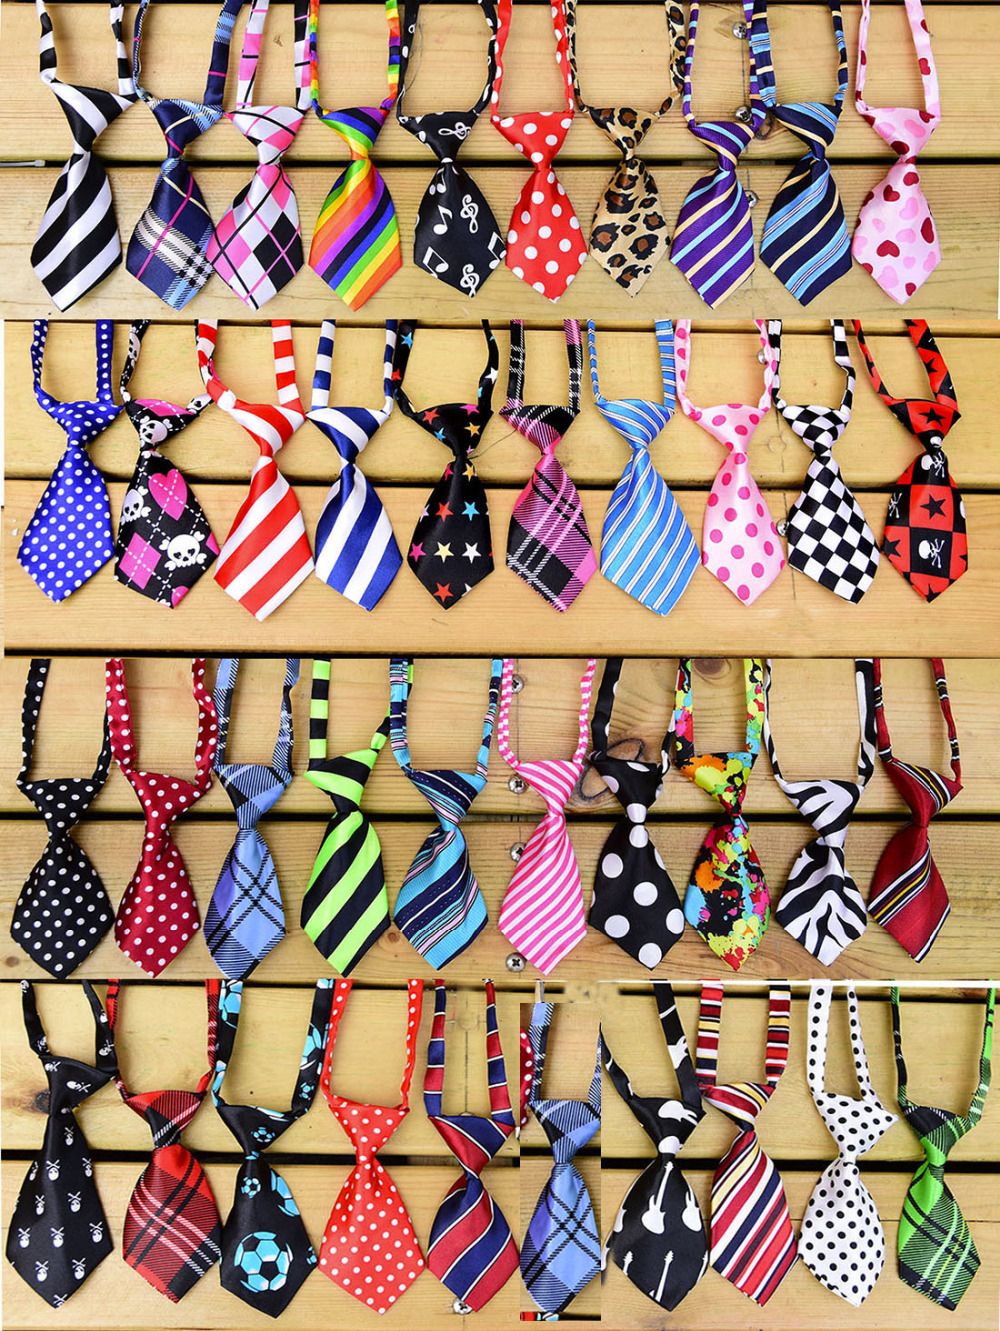 100pcs Pet Dog Neckties Adjustable Cat Dog Ties Bowties Ties  Pet Grooming  Supplies  Pet Shop Dog Accessories Mix 40 Colours